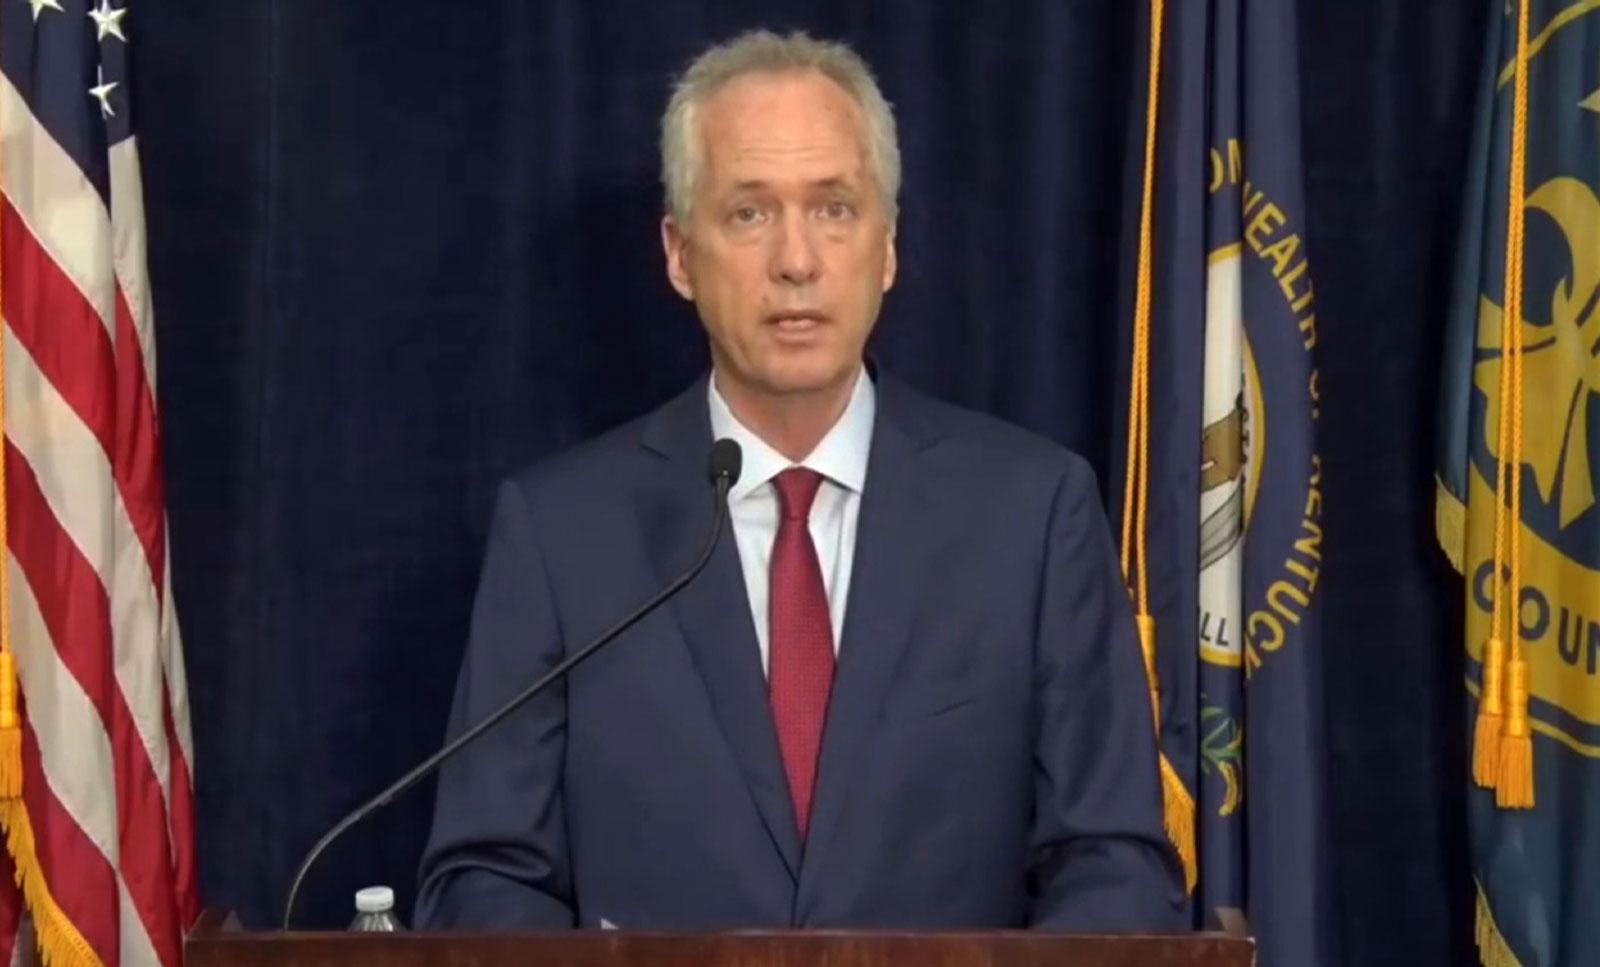 Louisville Mayor Greg Fischer speaks during a press conference on Thursday, September 24.